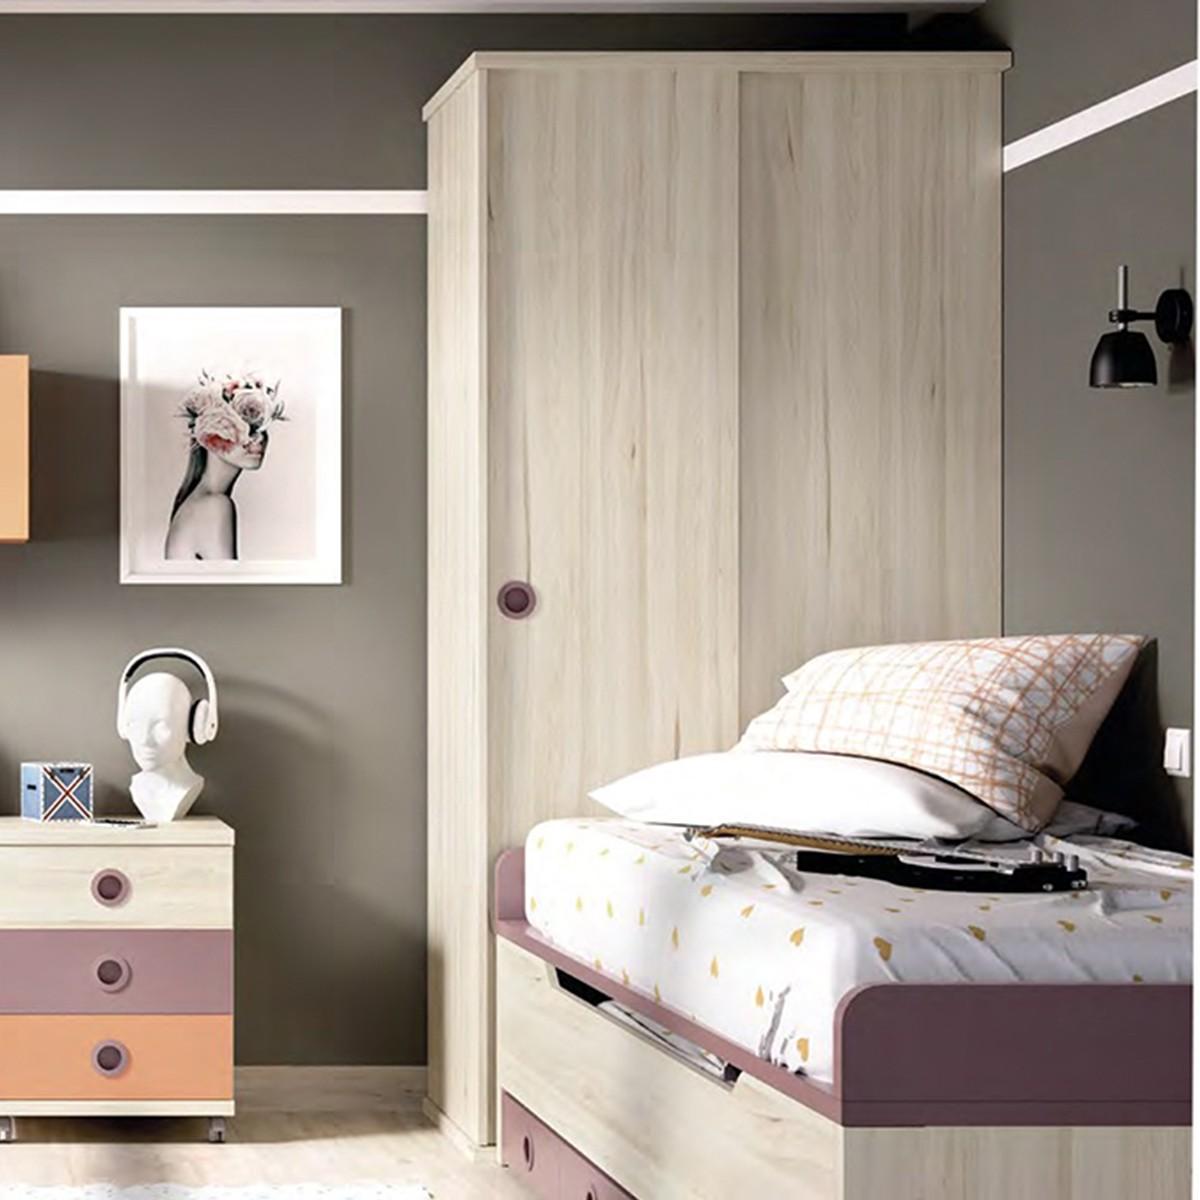 Corner Wardrobe With Slading And Folding Door